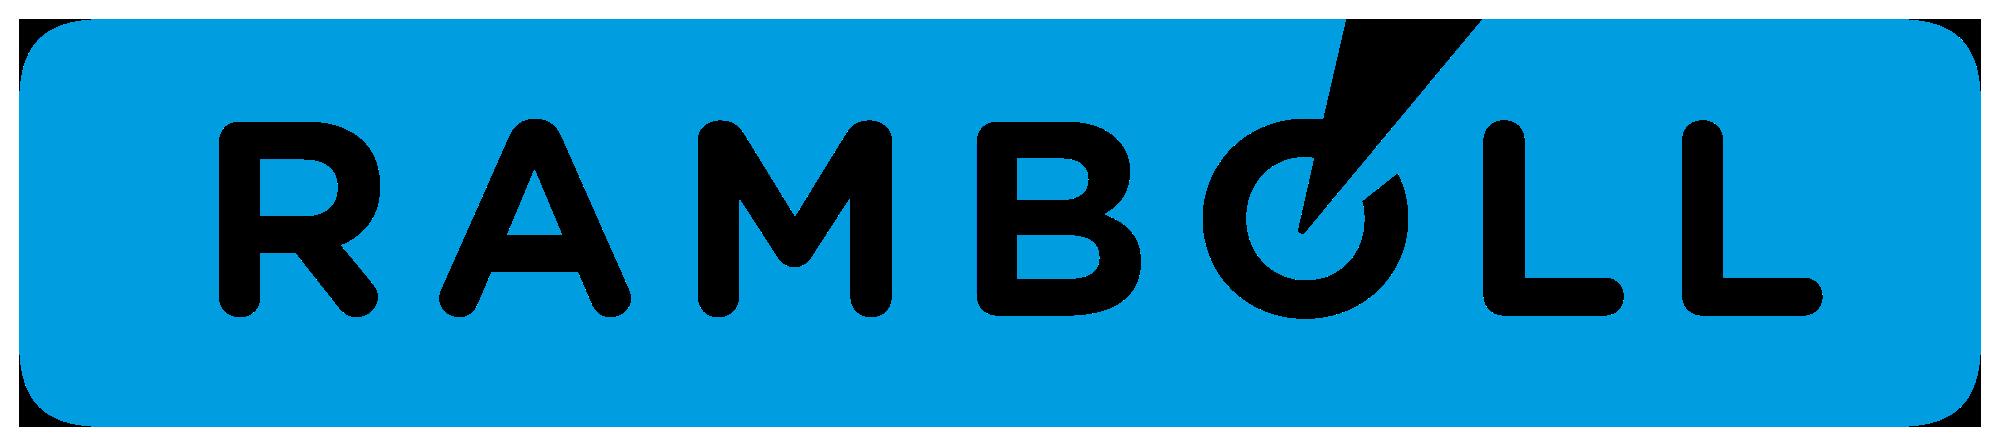 Ramboll logo